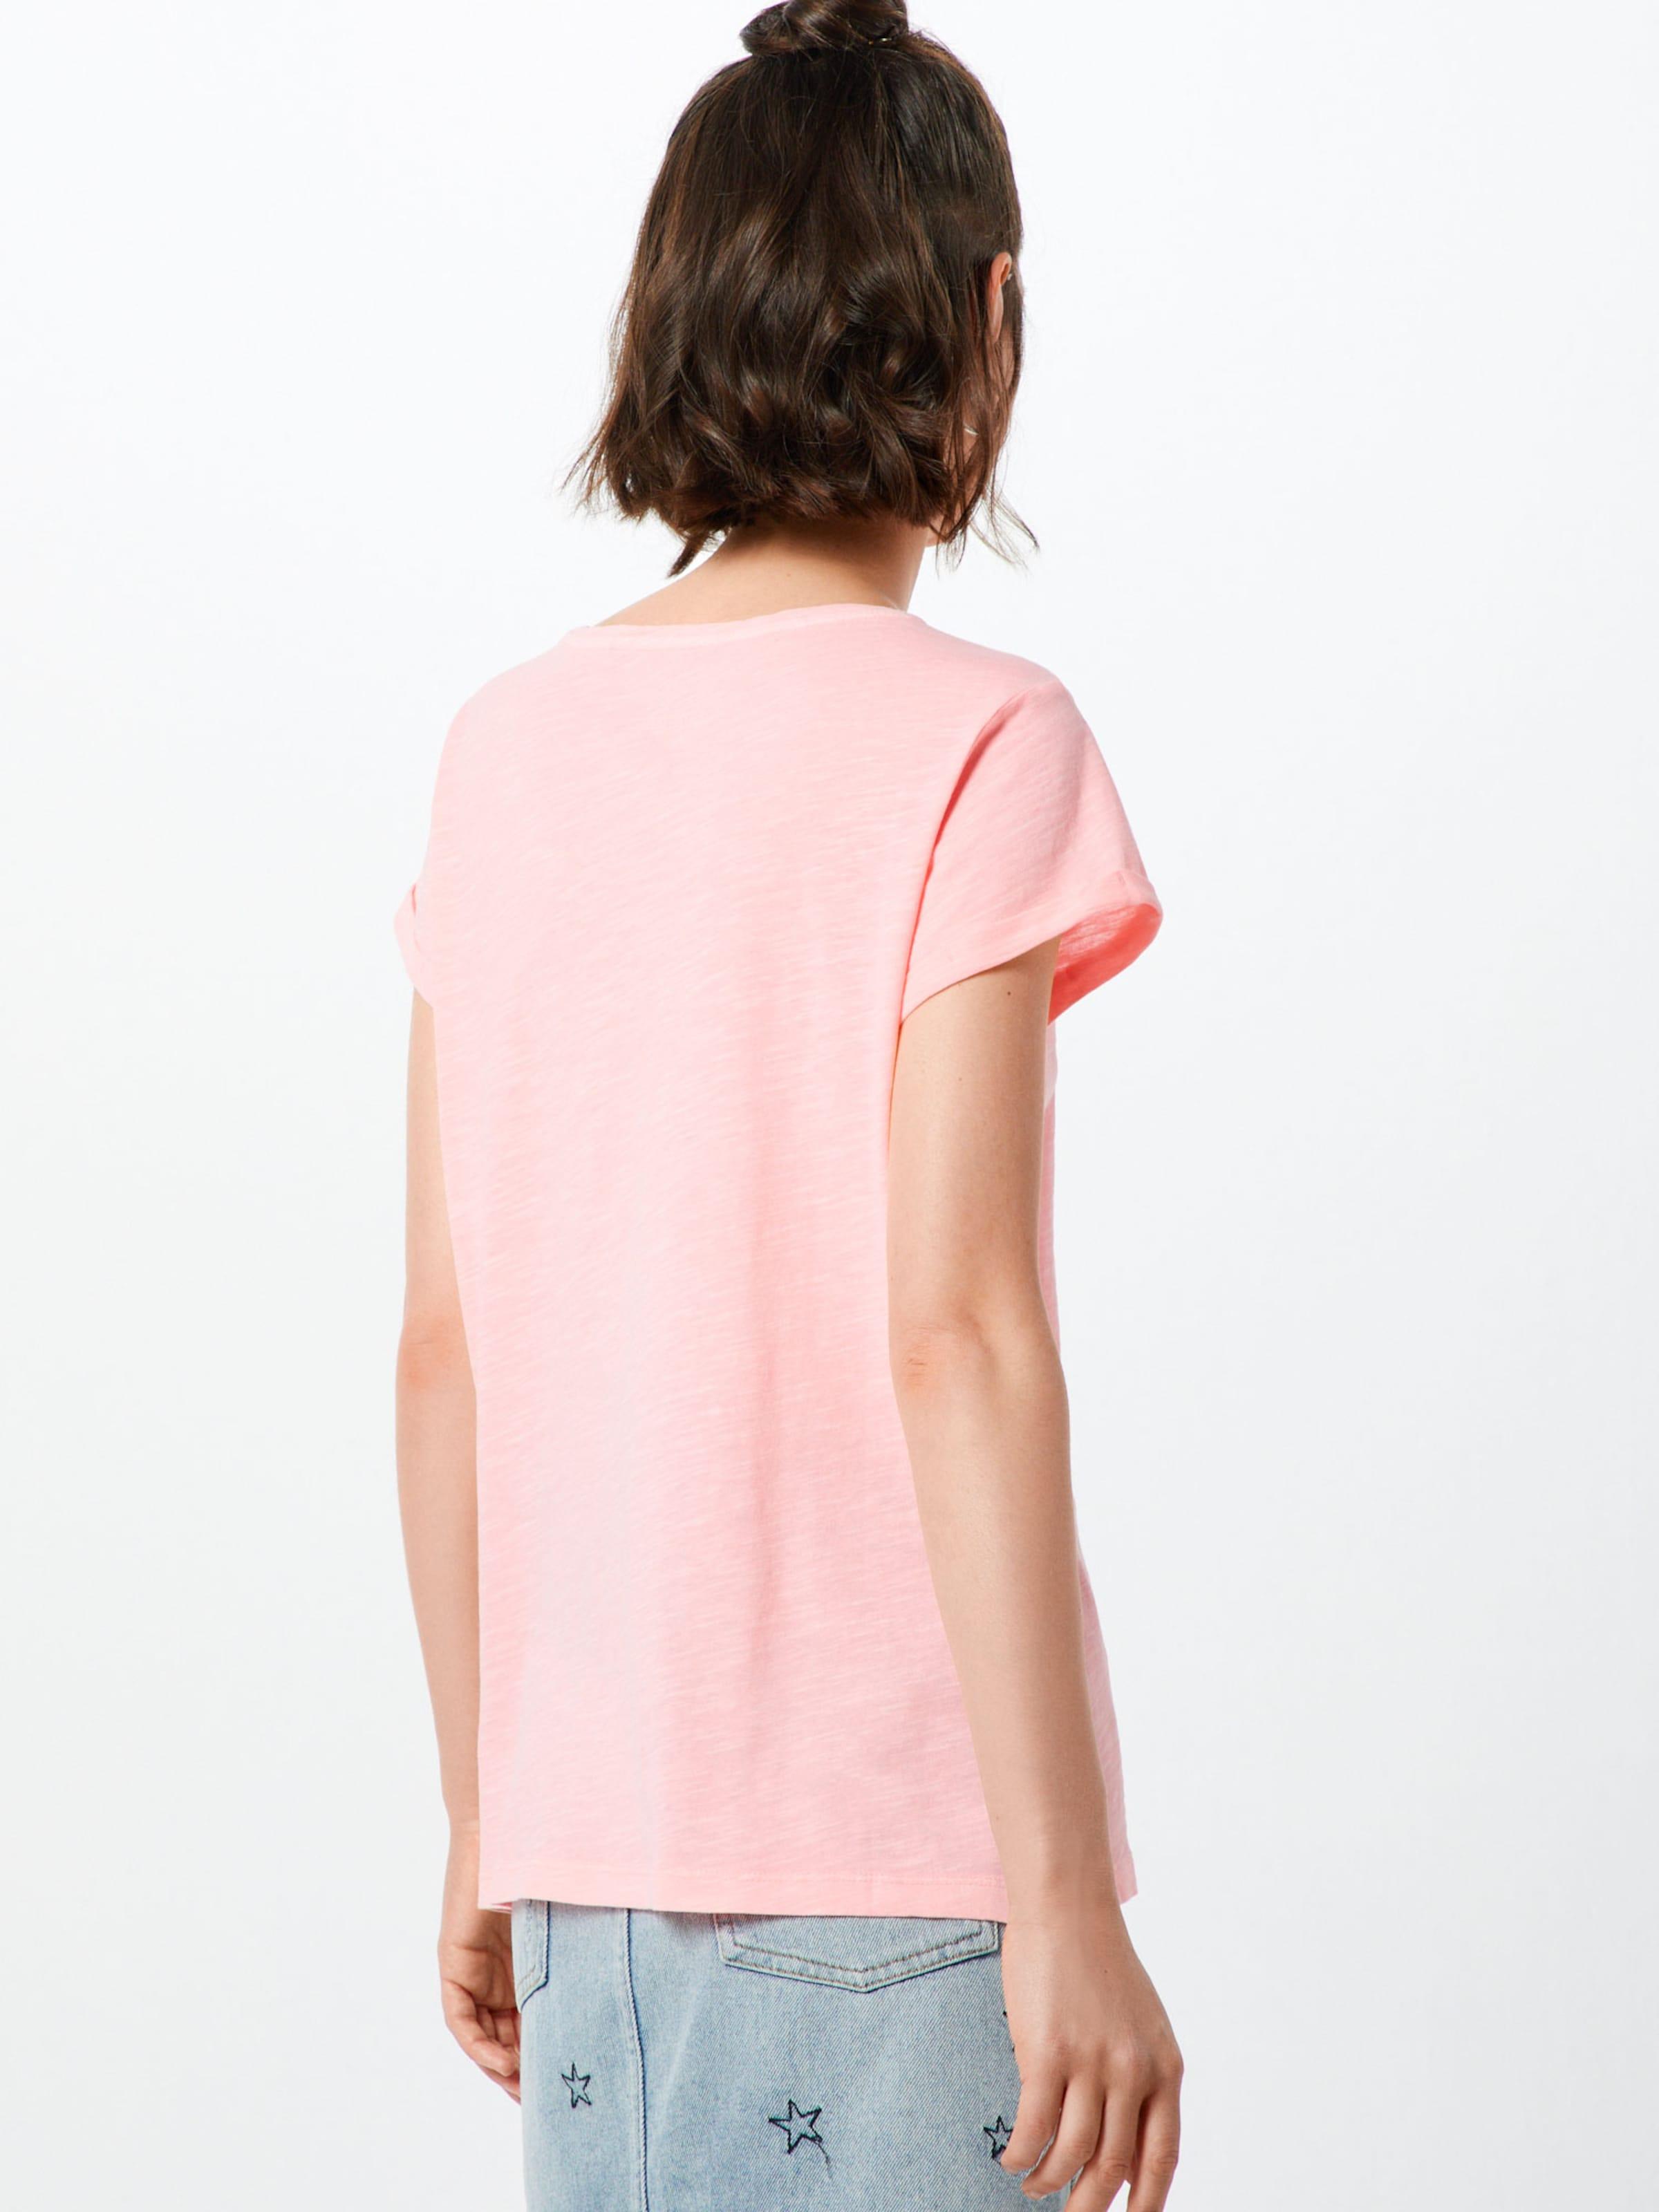 T shirt Edc Esprit En Jaune By 54ARjqL3